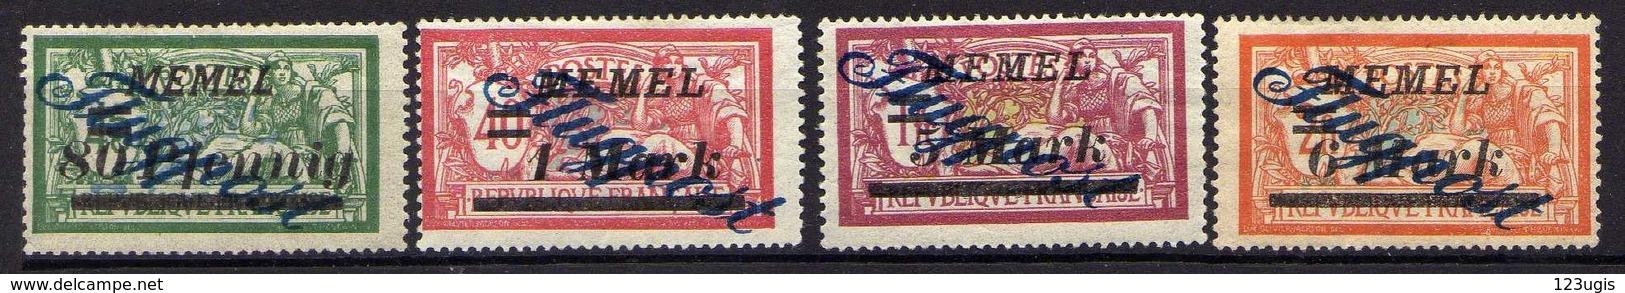 Memel 1922 Mi 73-74; 81-82 *, Flugpost / Air Mail [120119XXII] - Memelgebiet